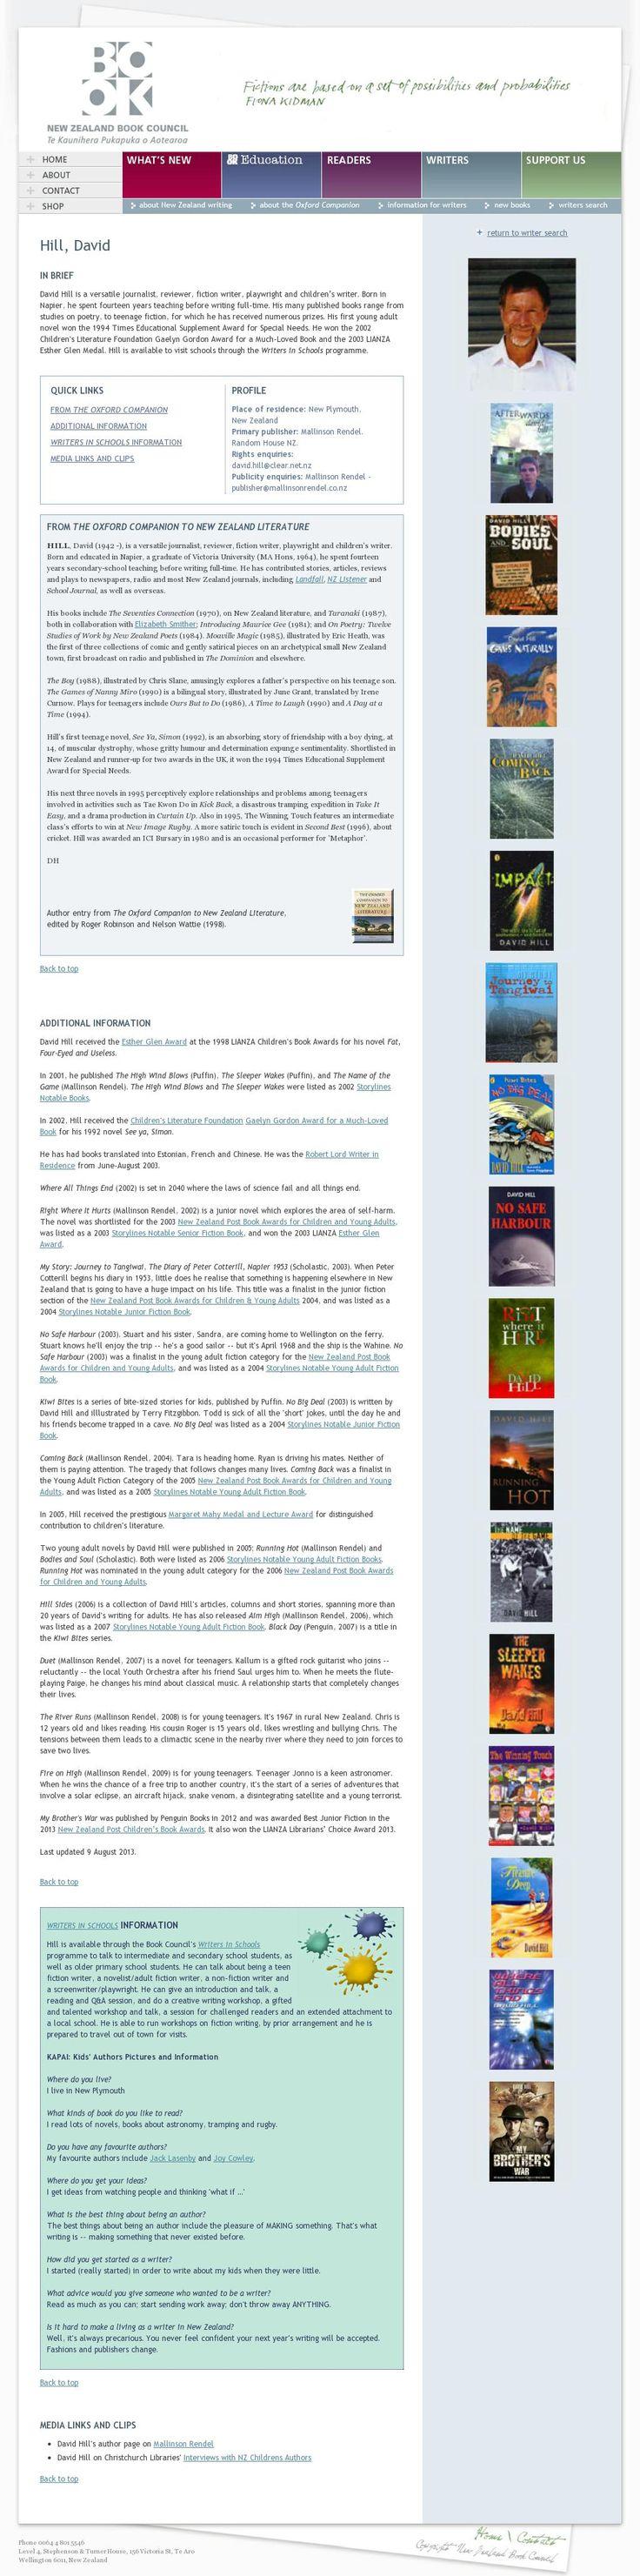 The website 'http://www.bookcouncil.org.nz/writers/hilldavid.html' courtesy of @Pinstamatic (http://pinstamatic.com)